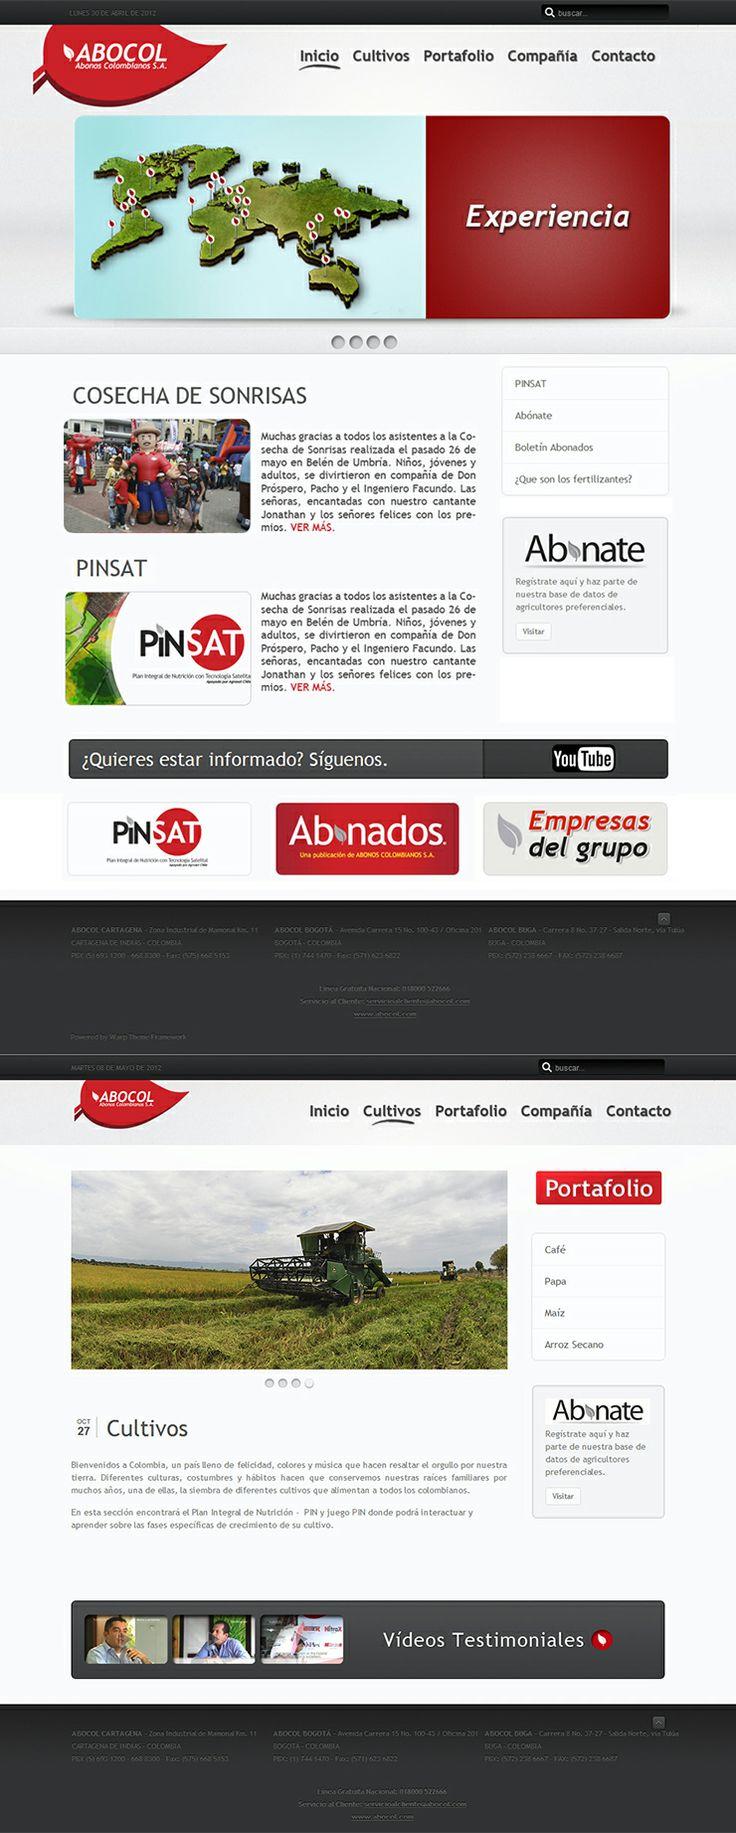 Web Abocol internacional